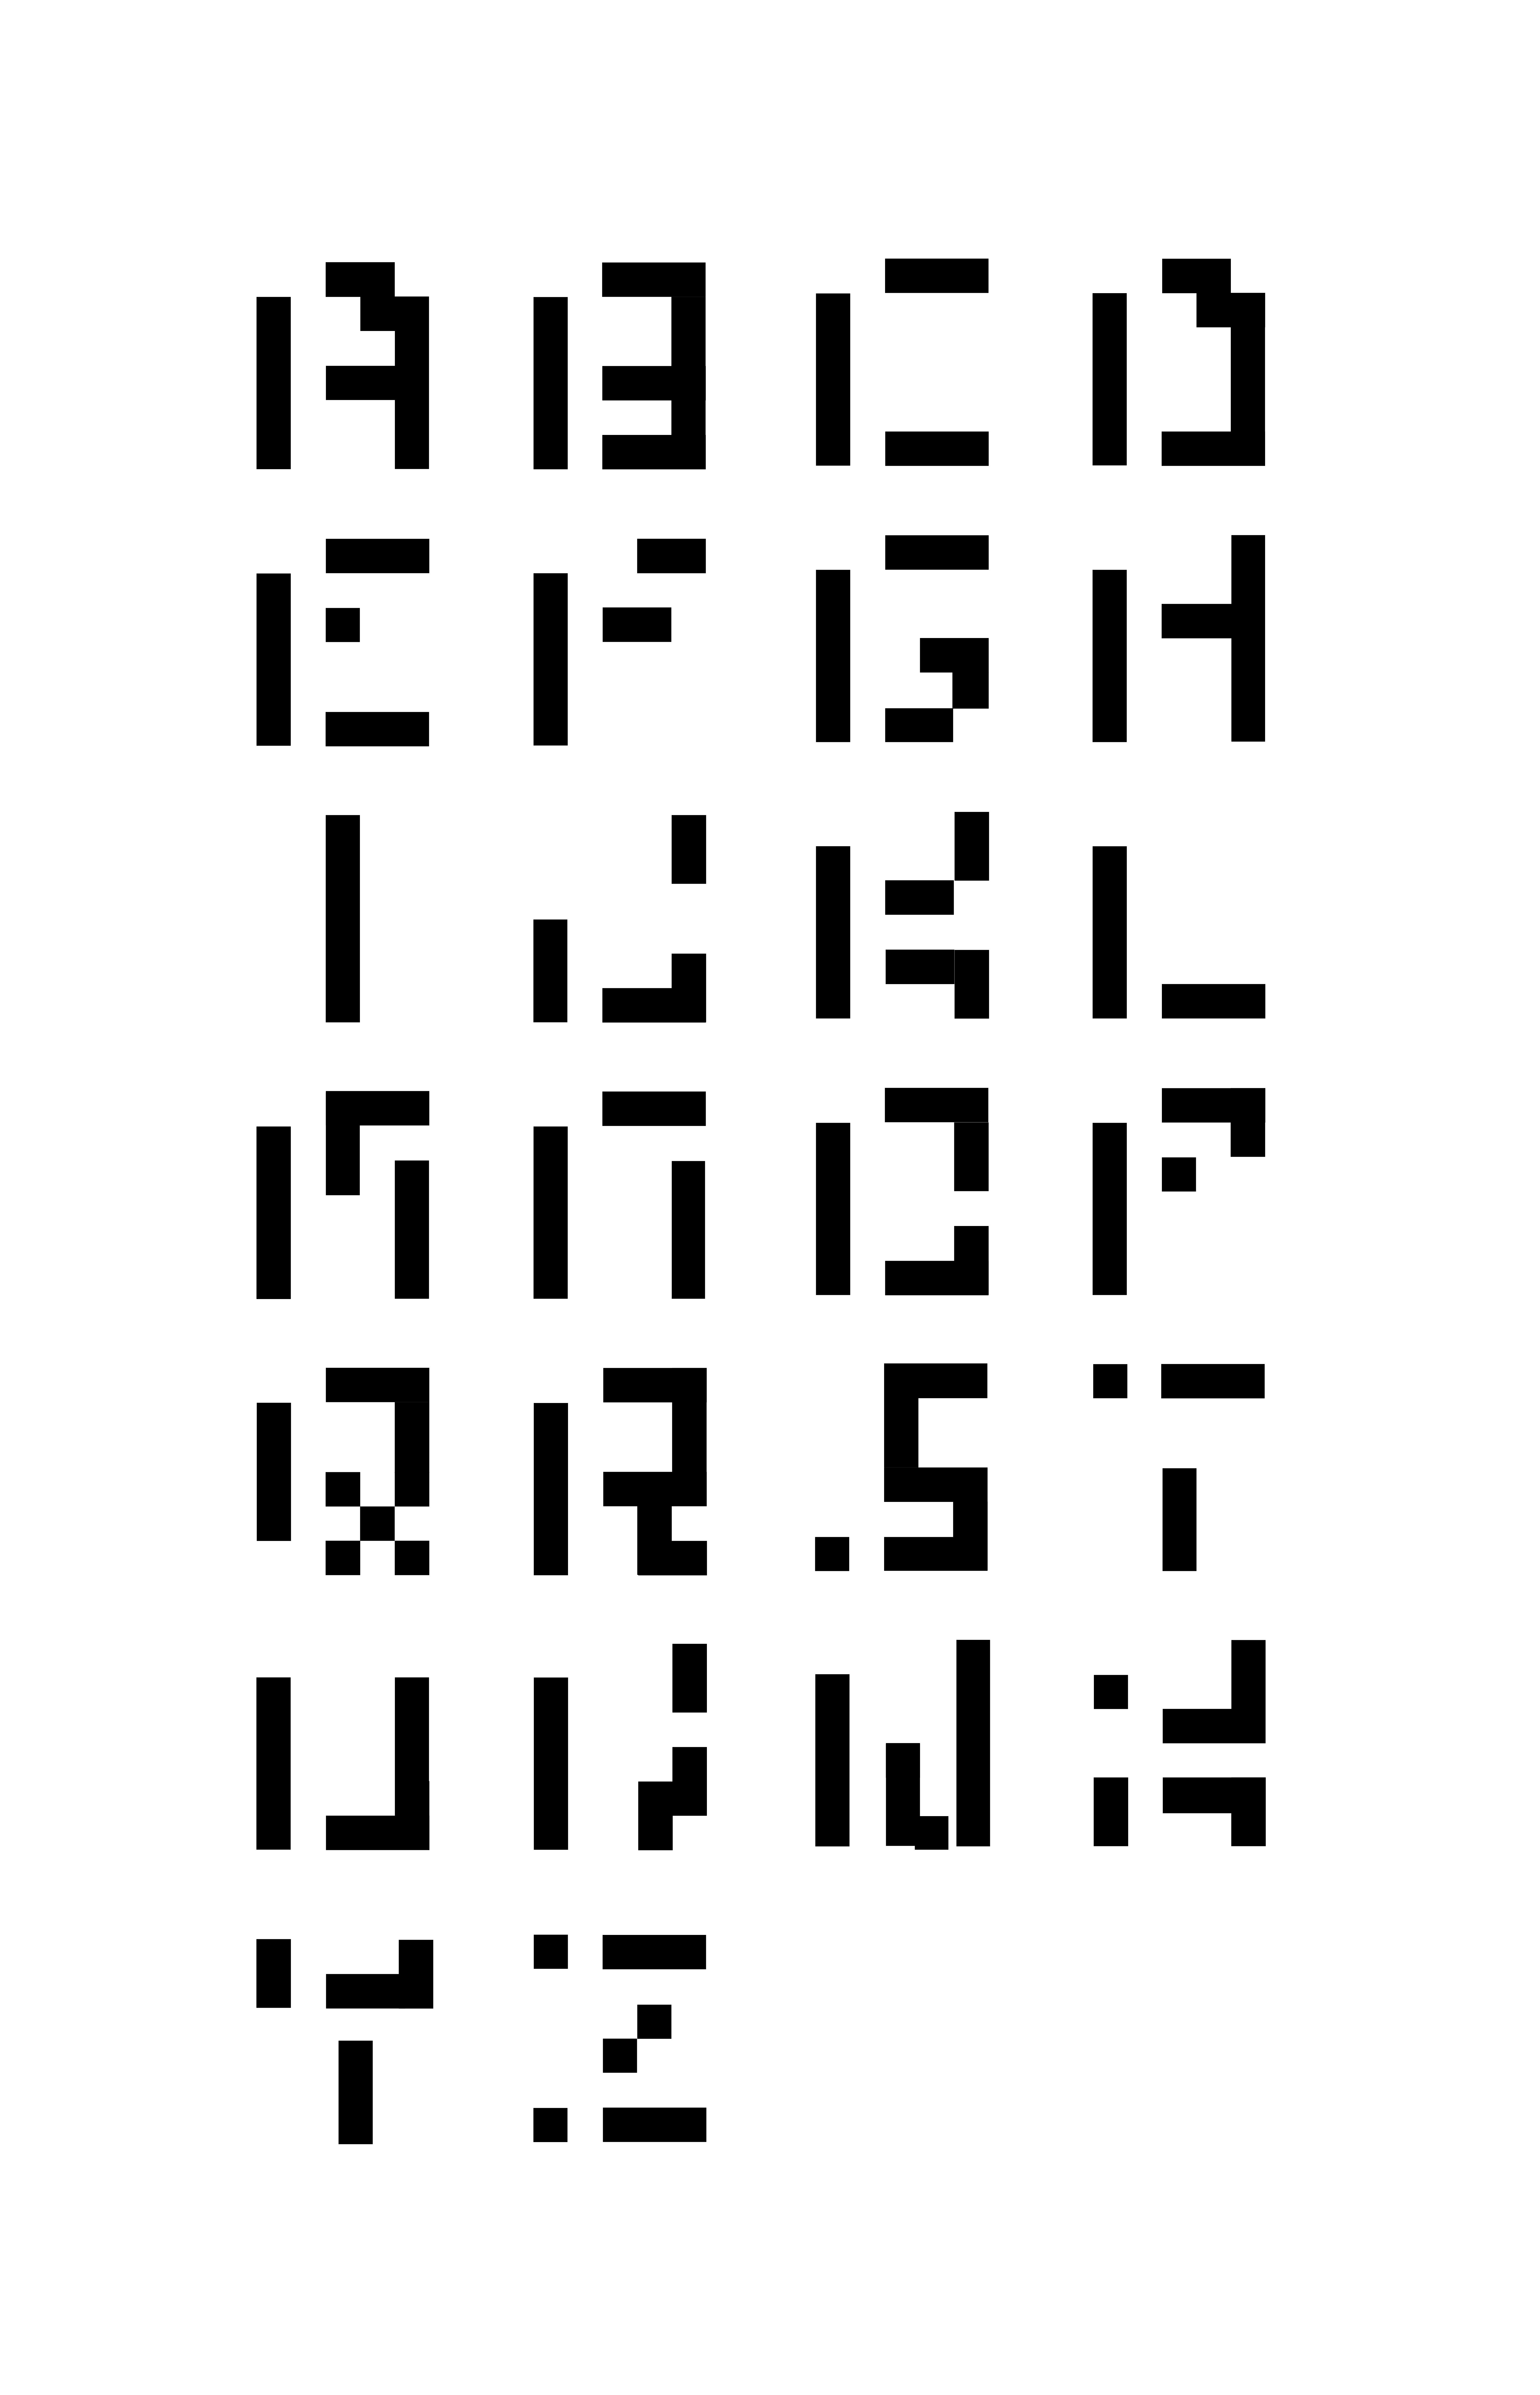 Bit Fonts